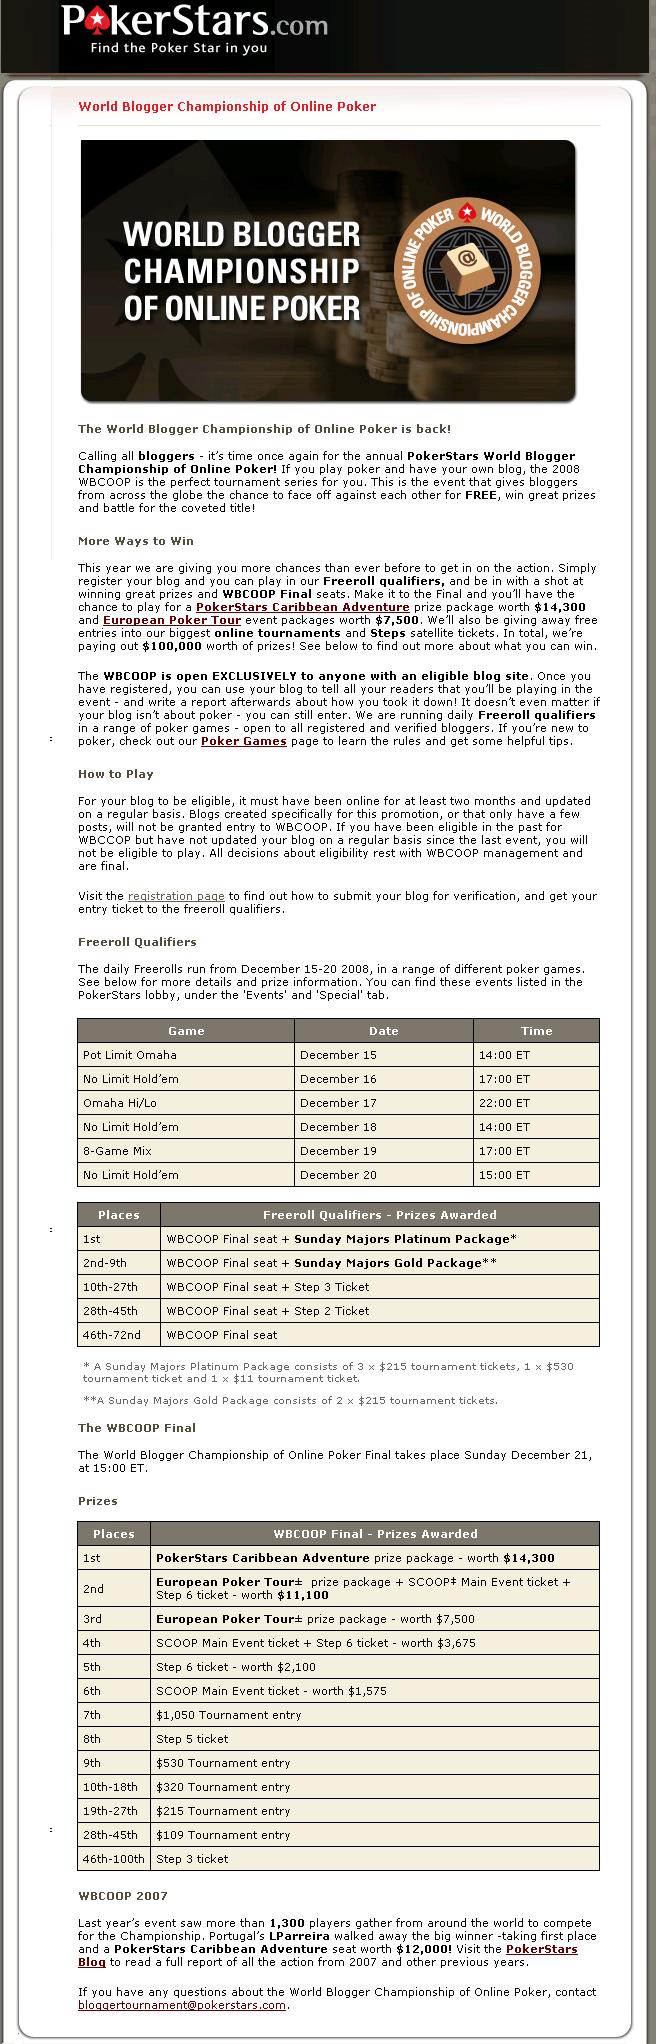 WBCOOP TOURNAMENT - WORLD BLOGGER CHAMPIONSHIP OF ONLINE POKER Registration Wbcoop10